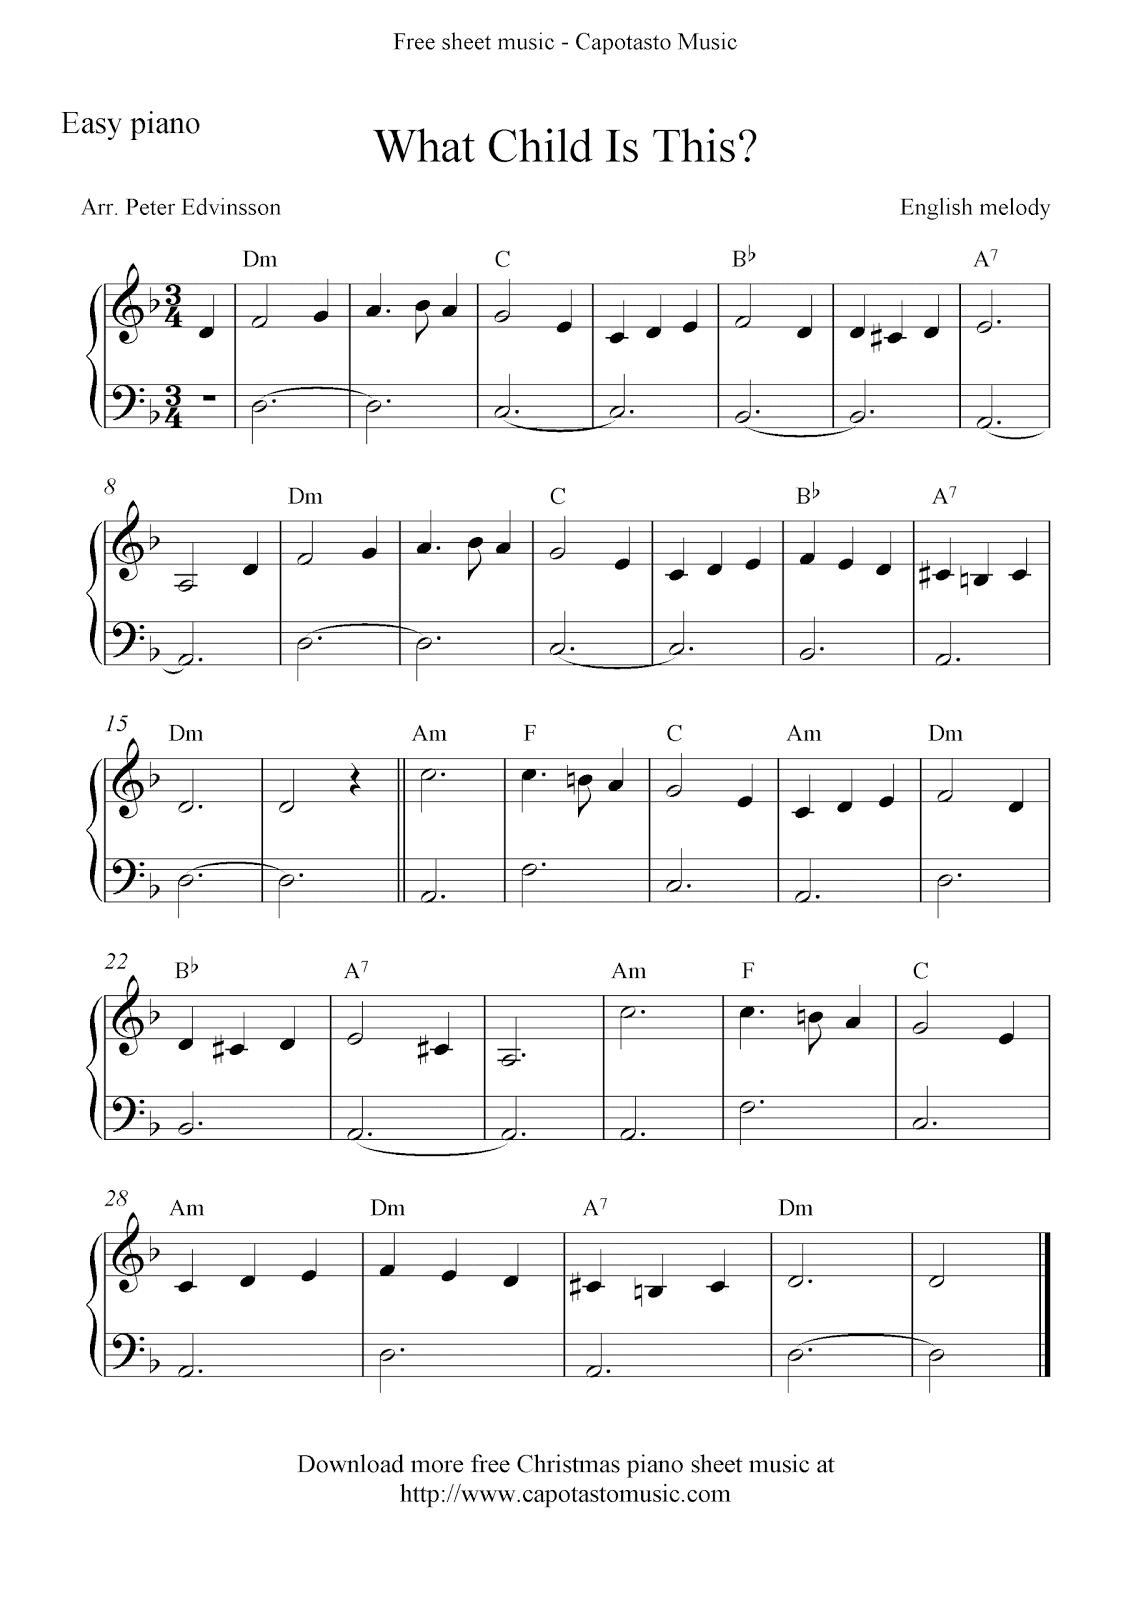 Free Christmas Sheet Music For Piano Feliz Navidad